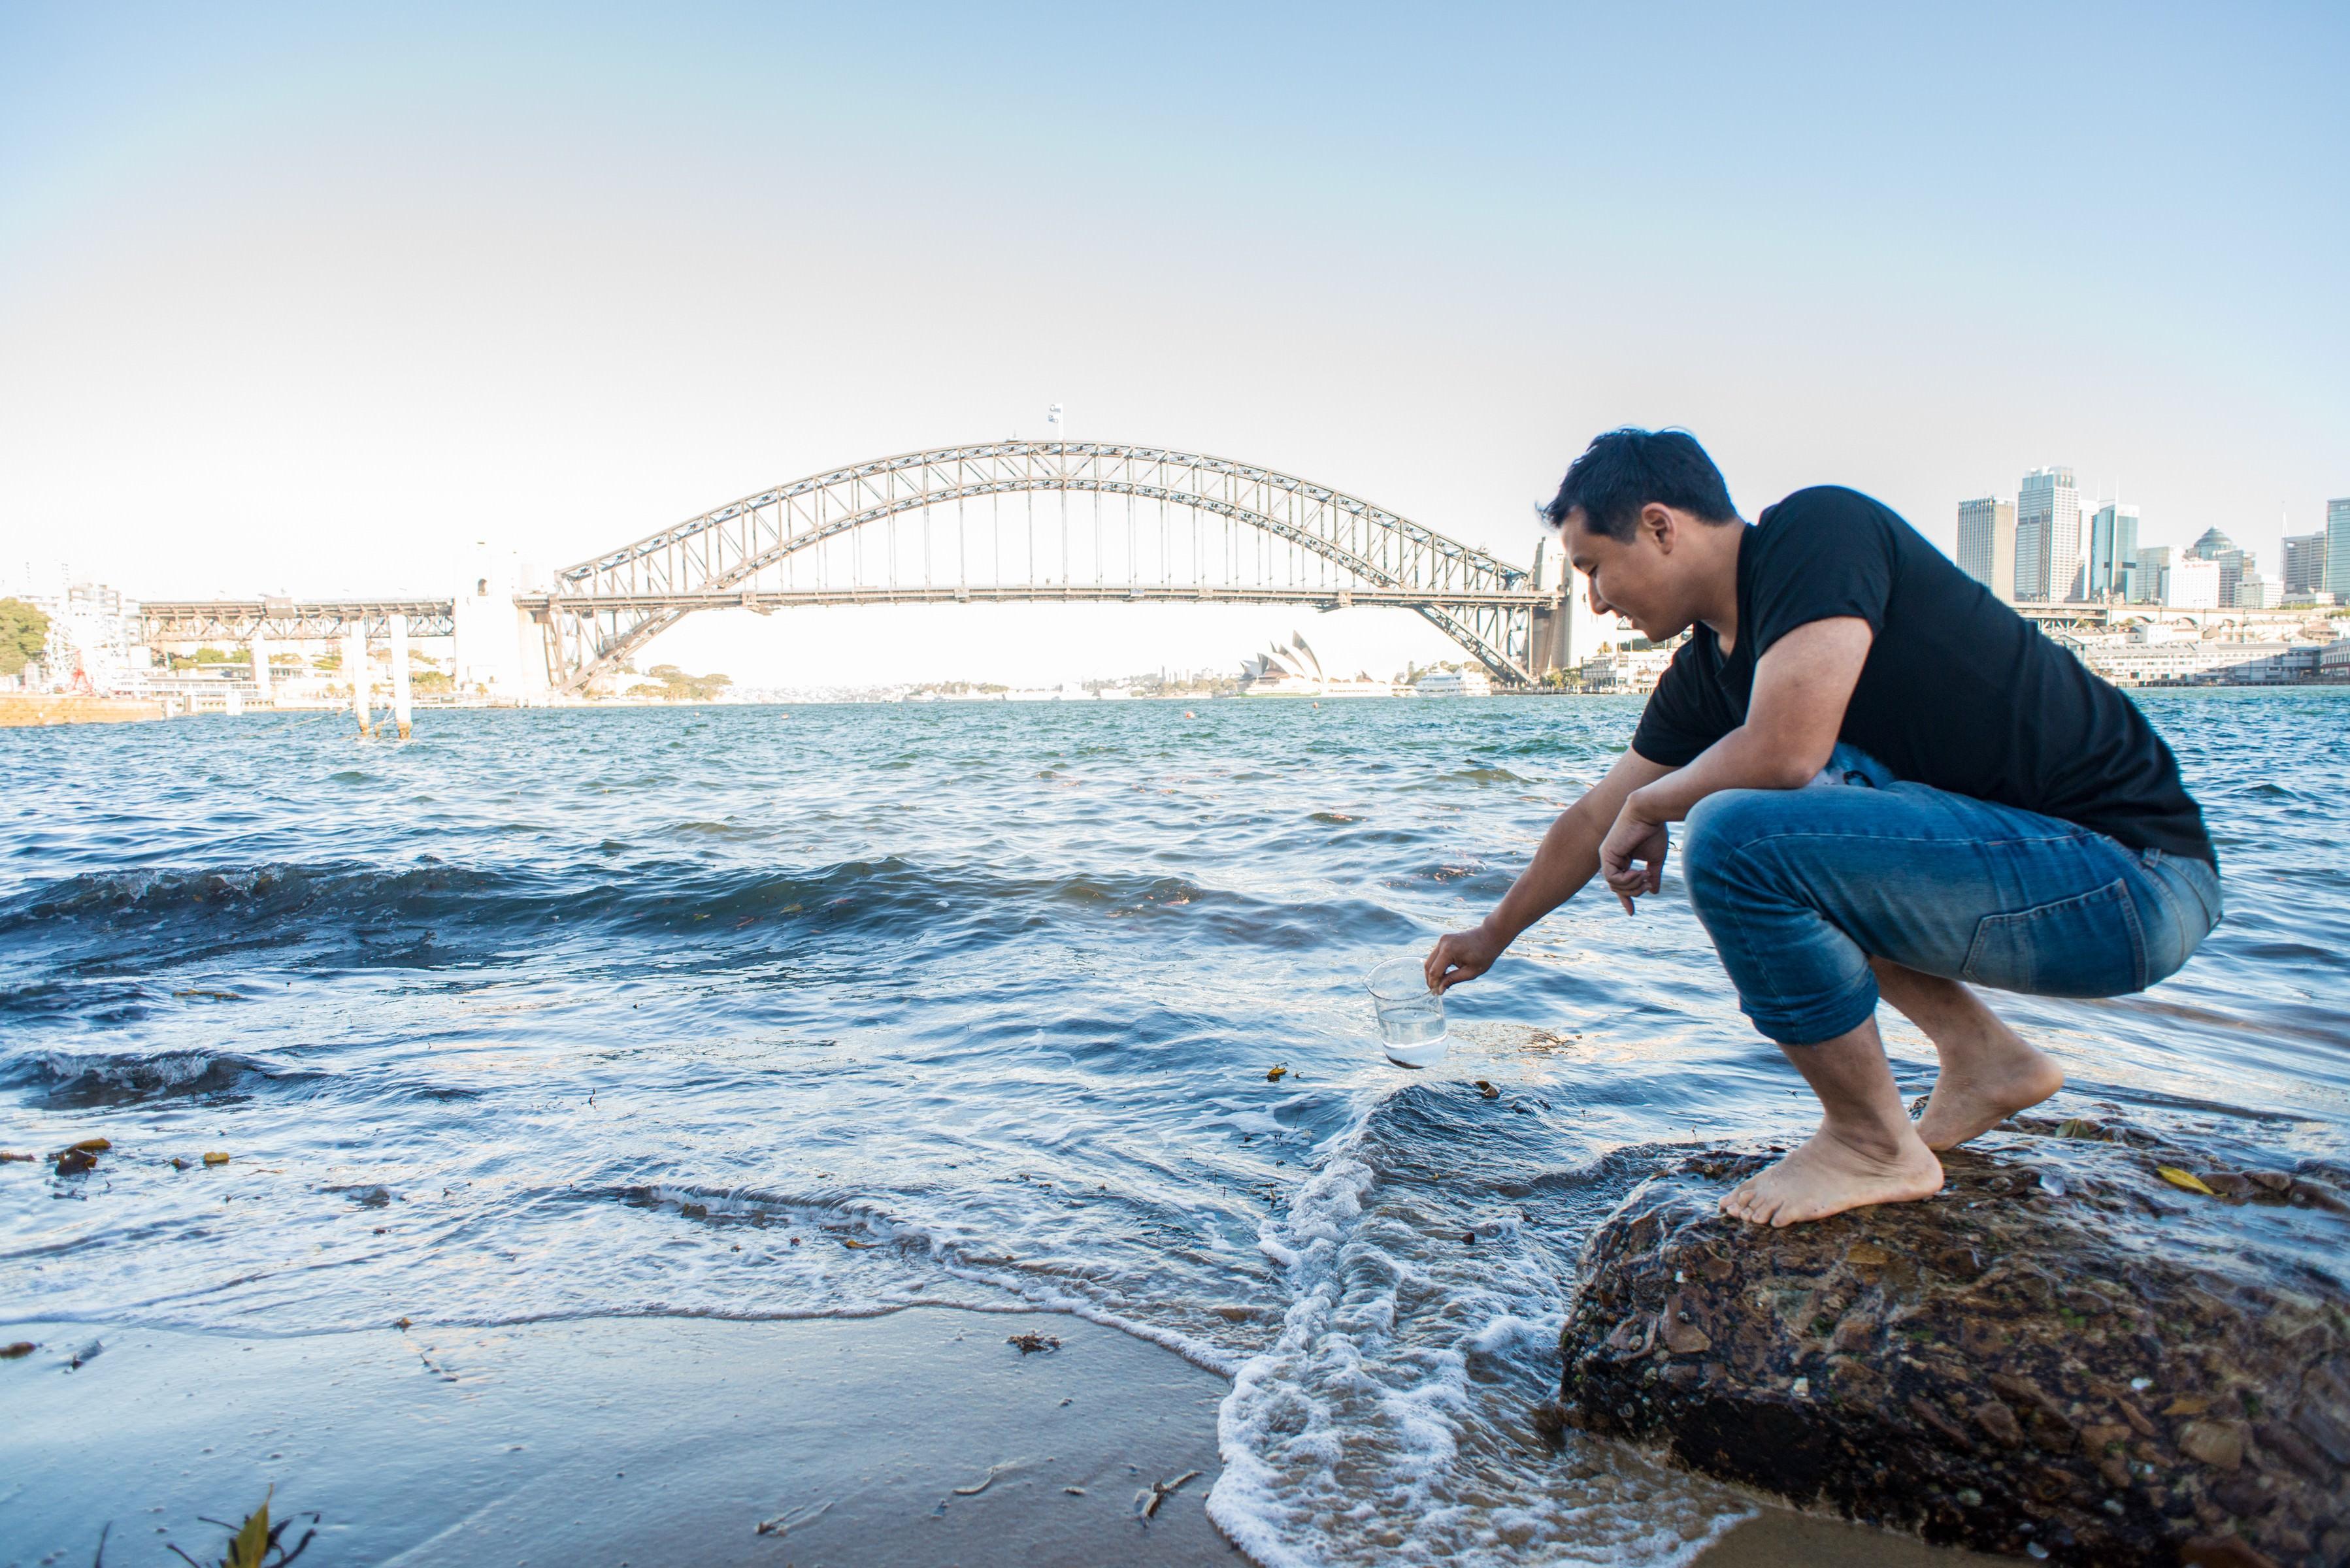 Tiny membrane makes Sydney Harbour